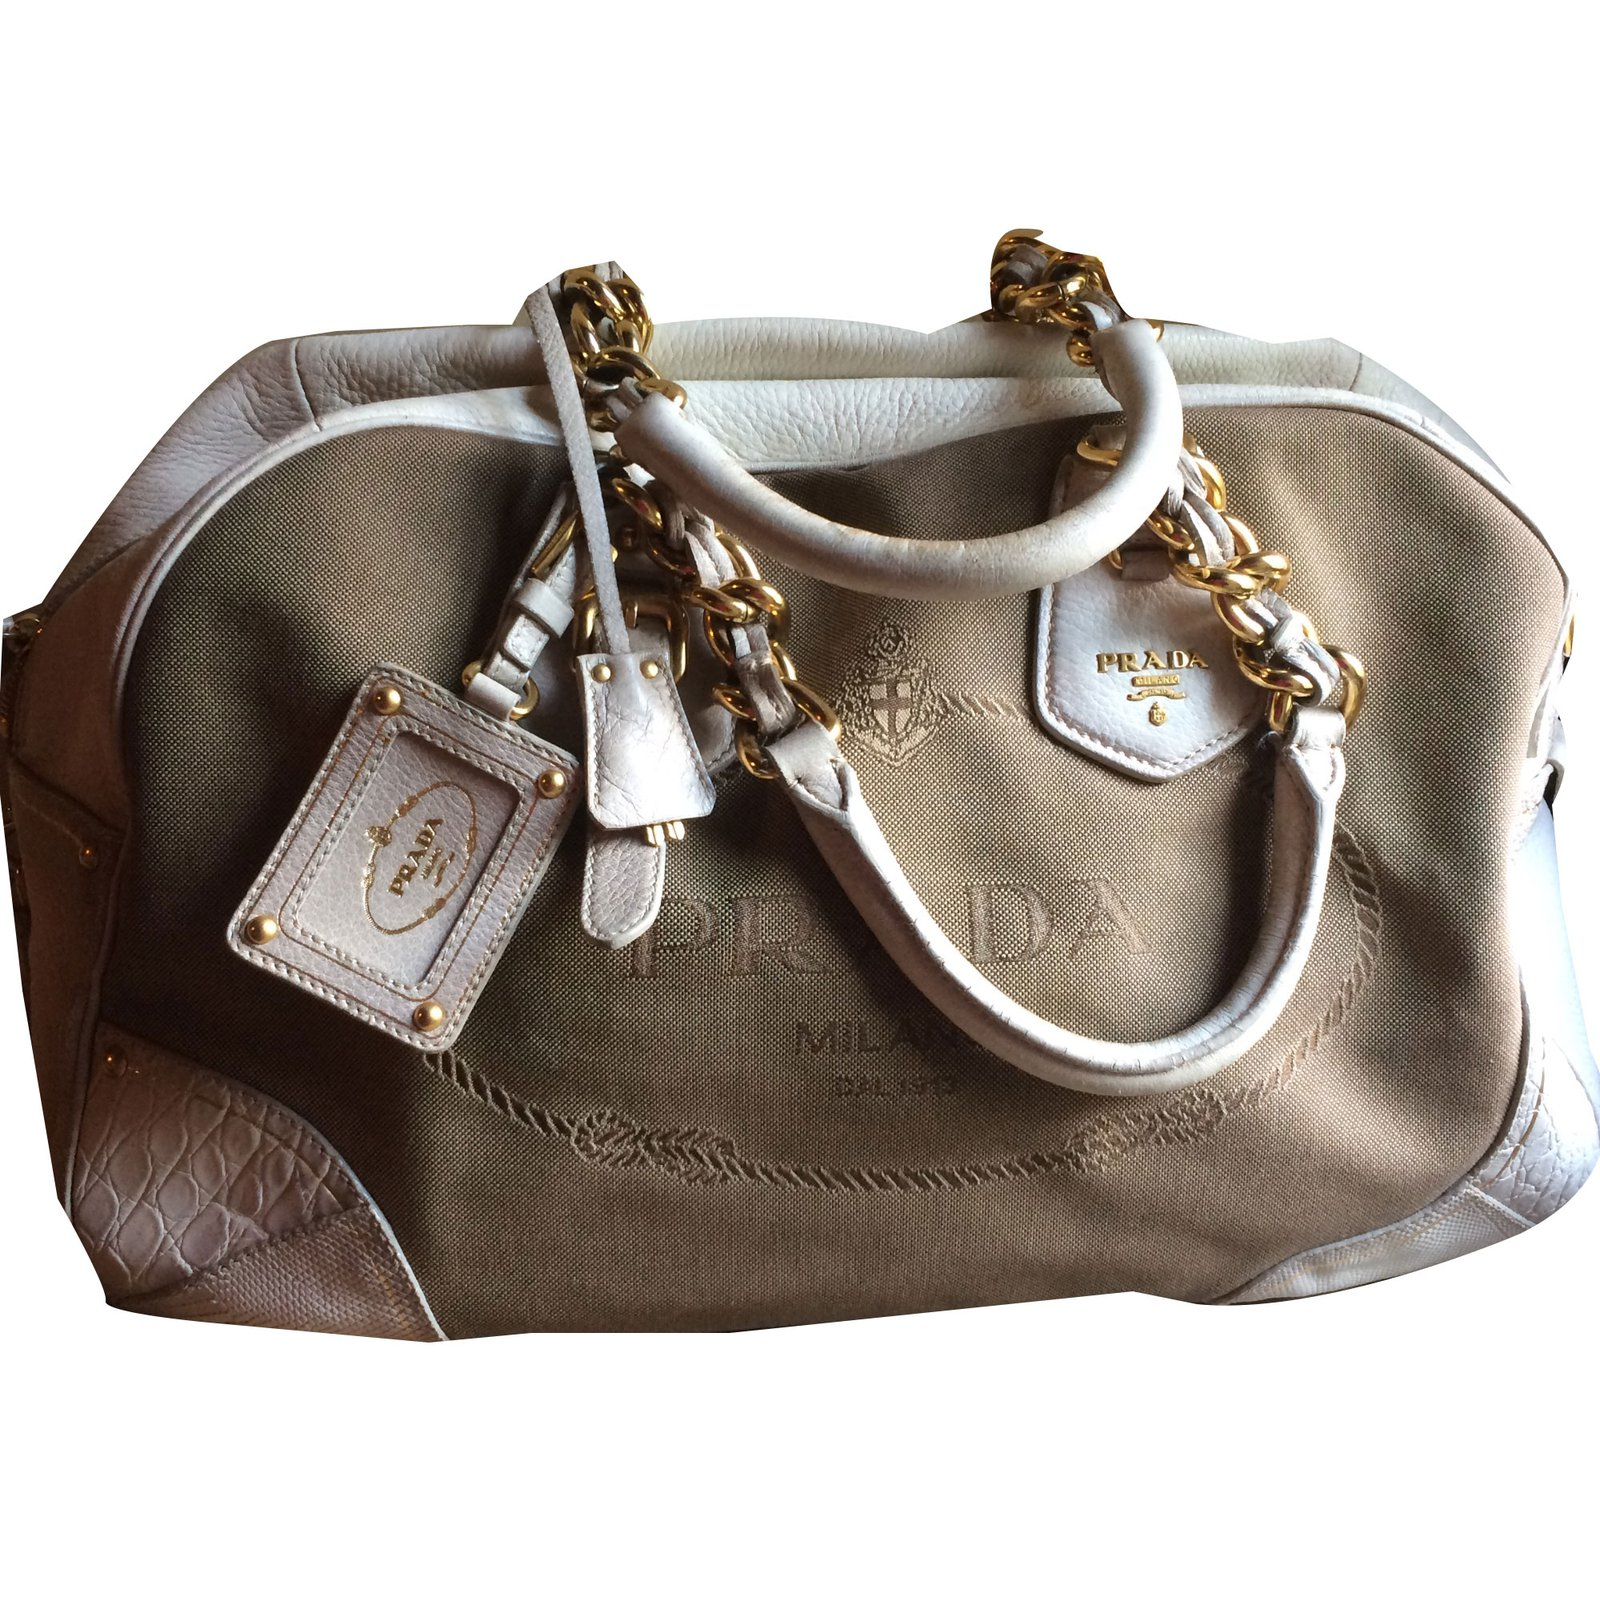 9c970a7ab7 Facebook · Pin This. Prada Handbags Handbags Cloth Beige ref.51775